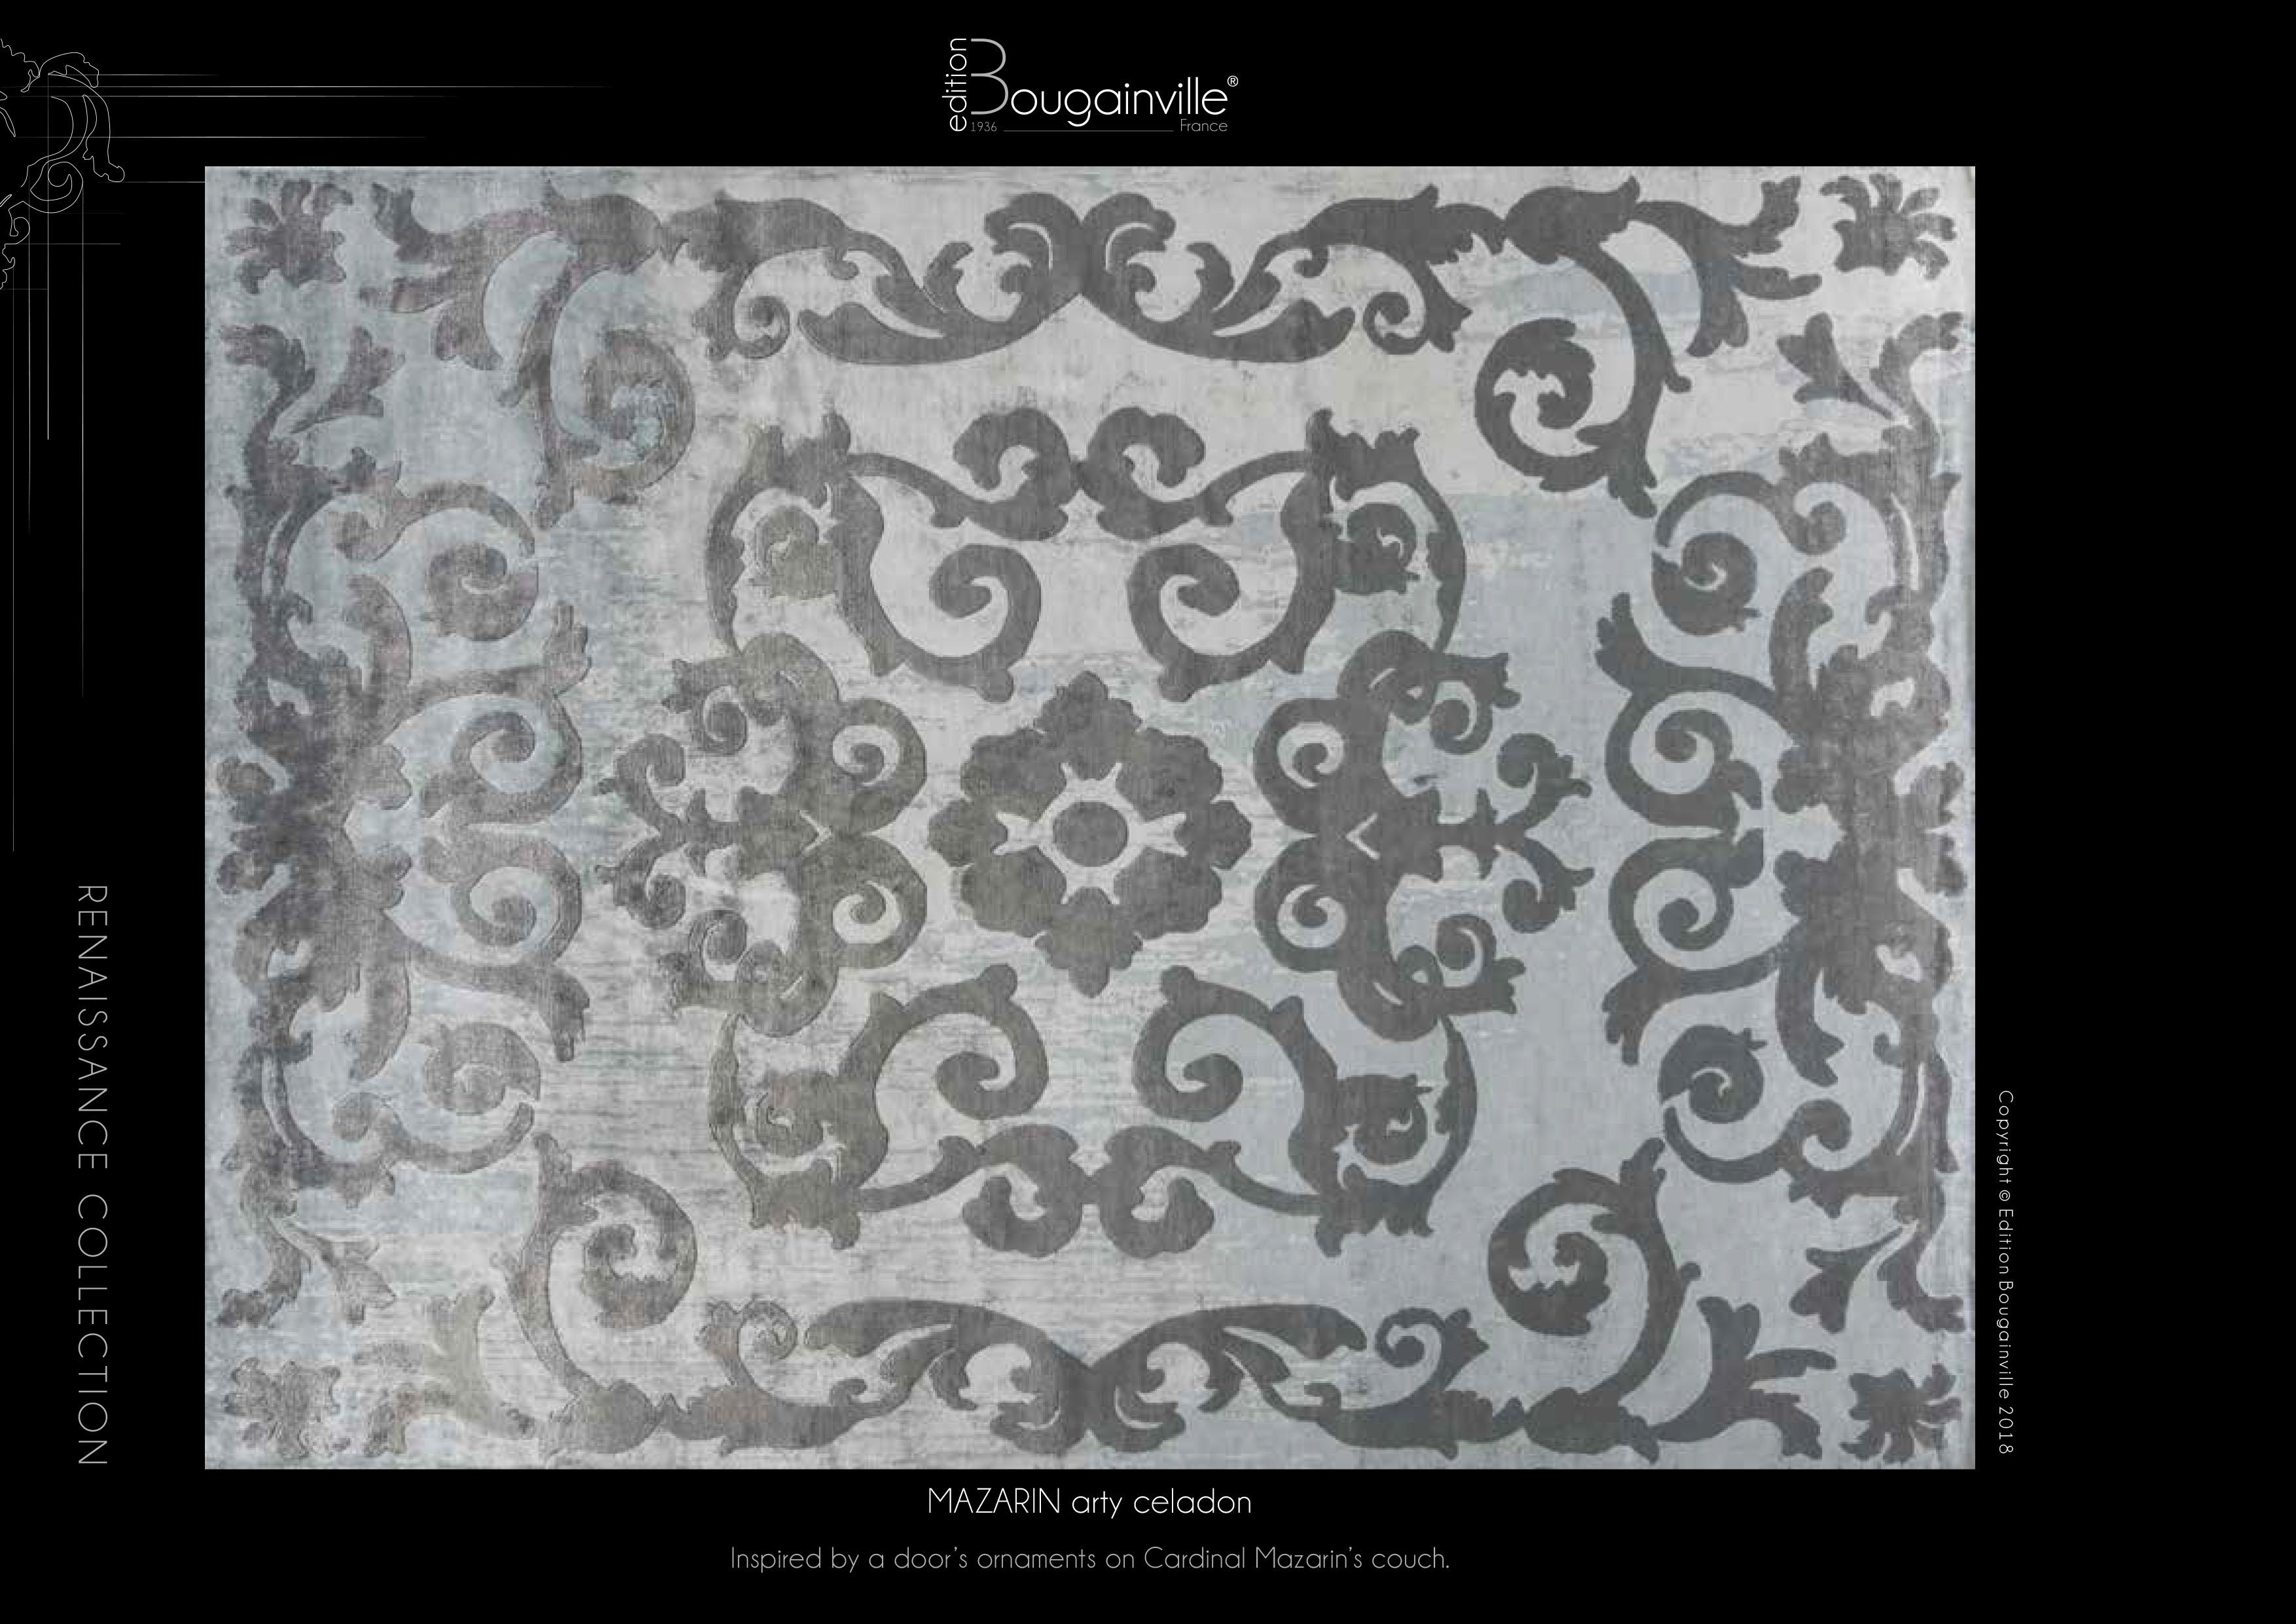 Ковер Edition Bougainville, MAZARIN arty celadon